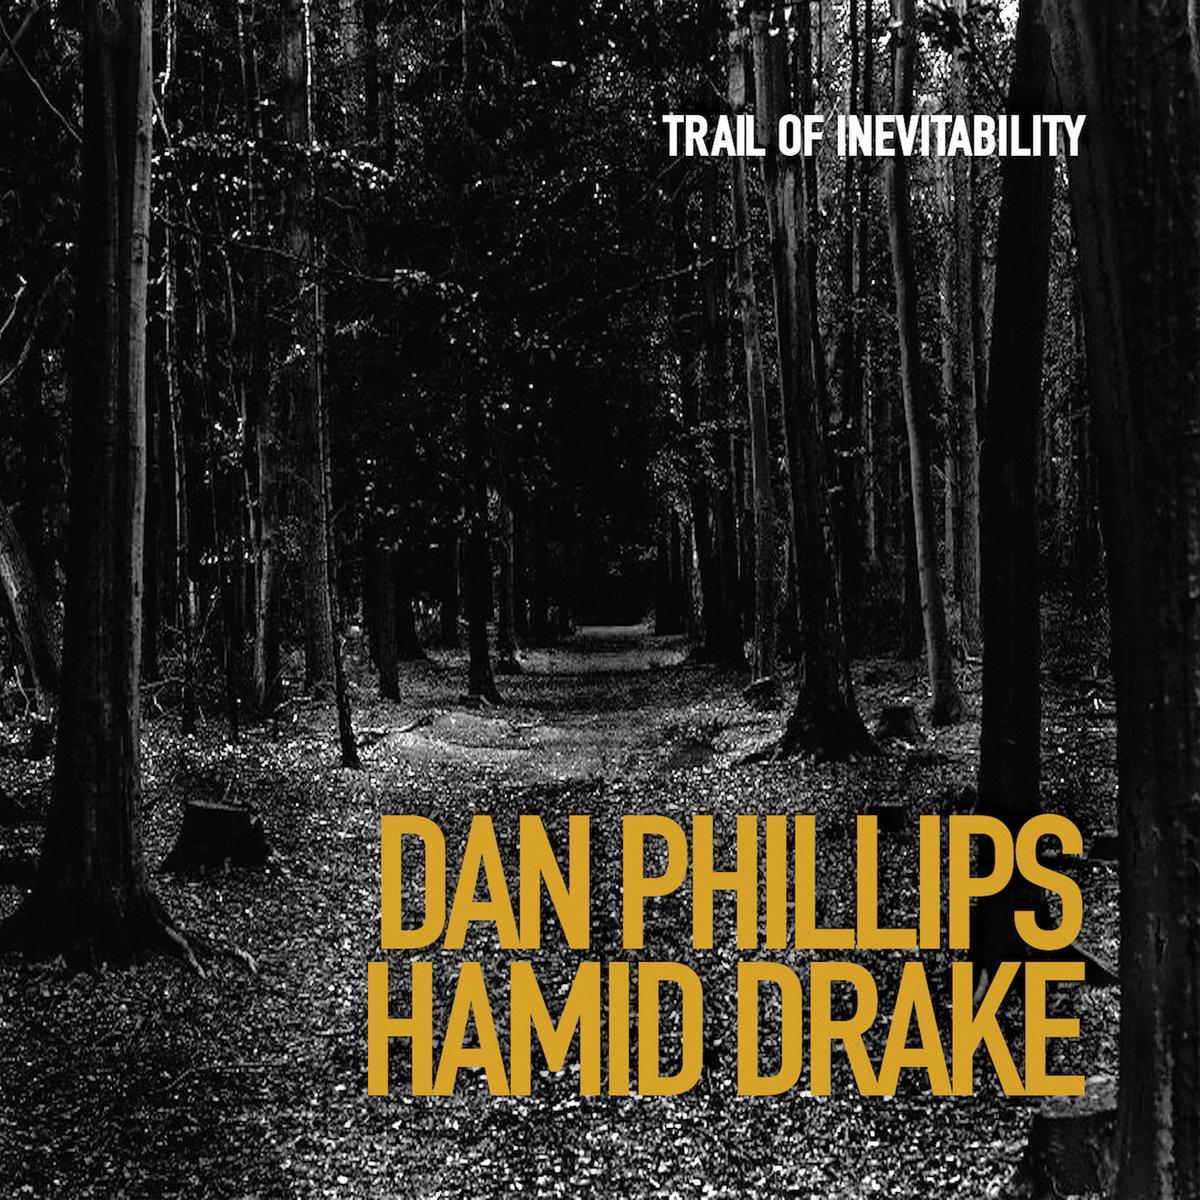 Trail of Inevitability | Dan Phillips